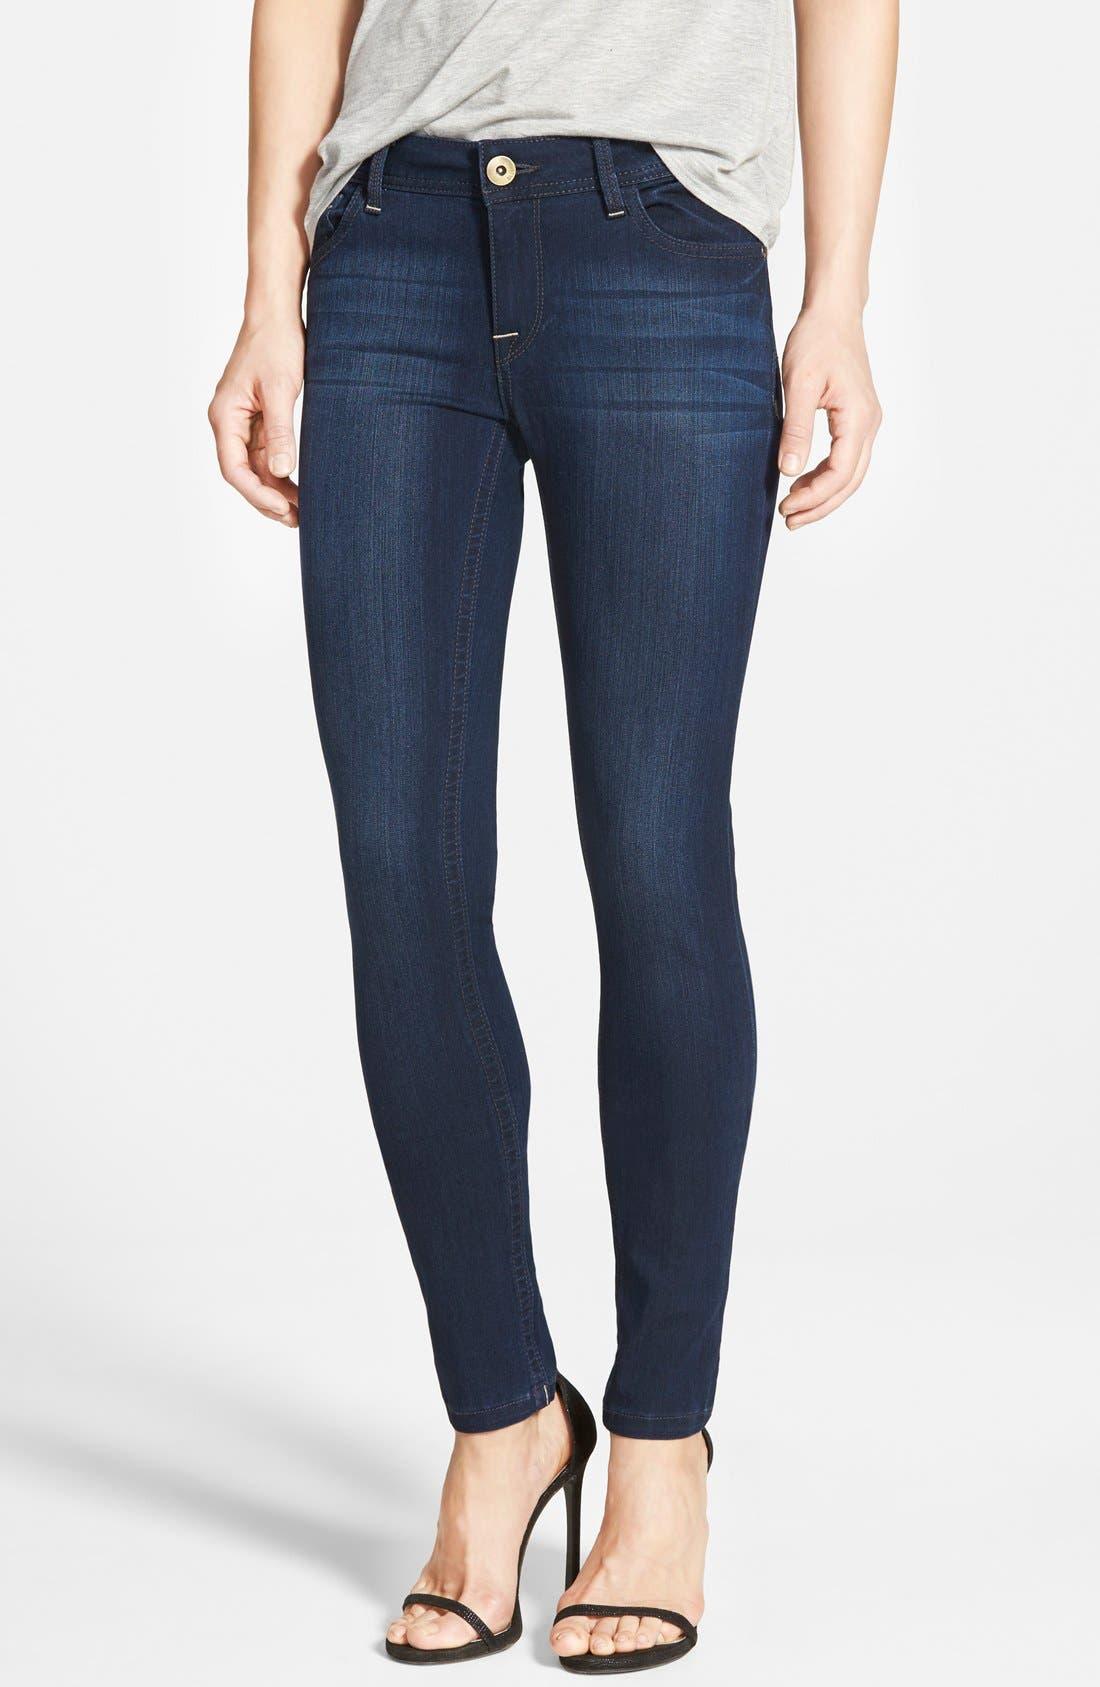 Main Image - DL1961 'Amanda' Skinny Jeans (Moscow)